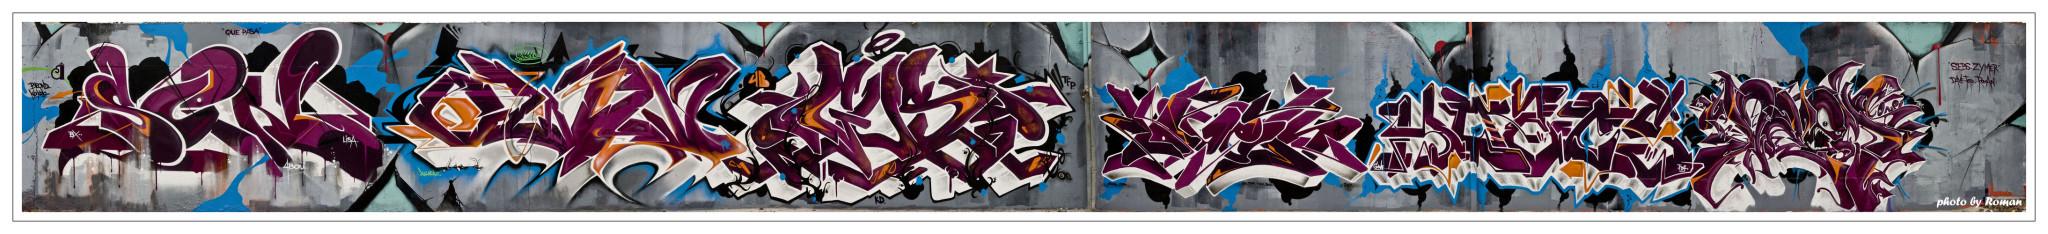 Artwork By Sen2, Logek